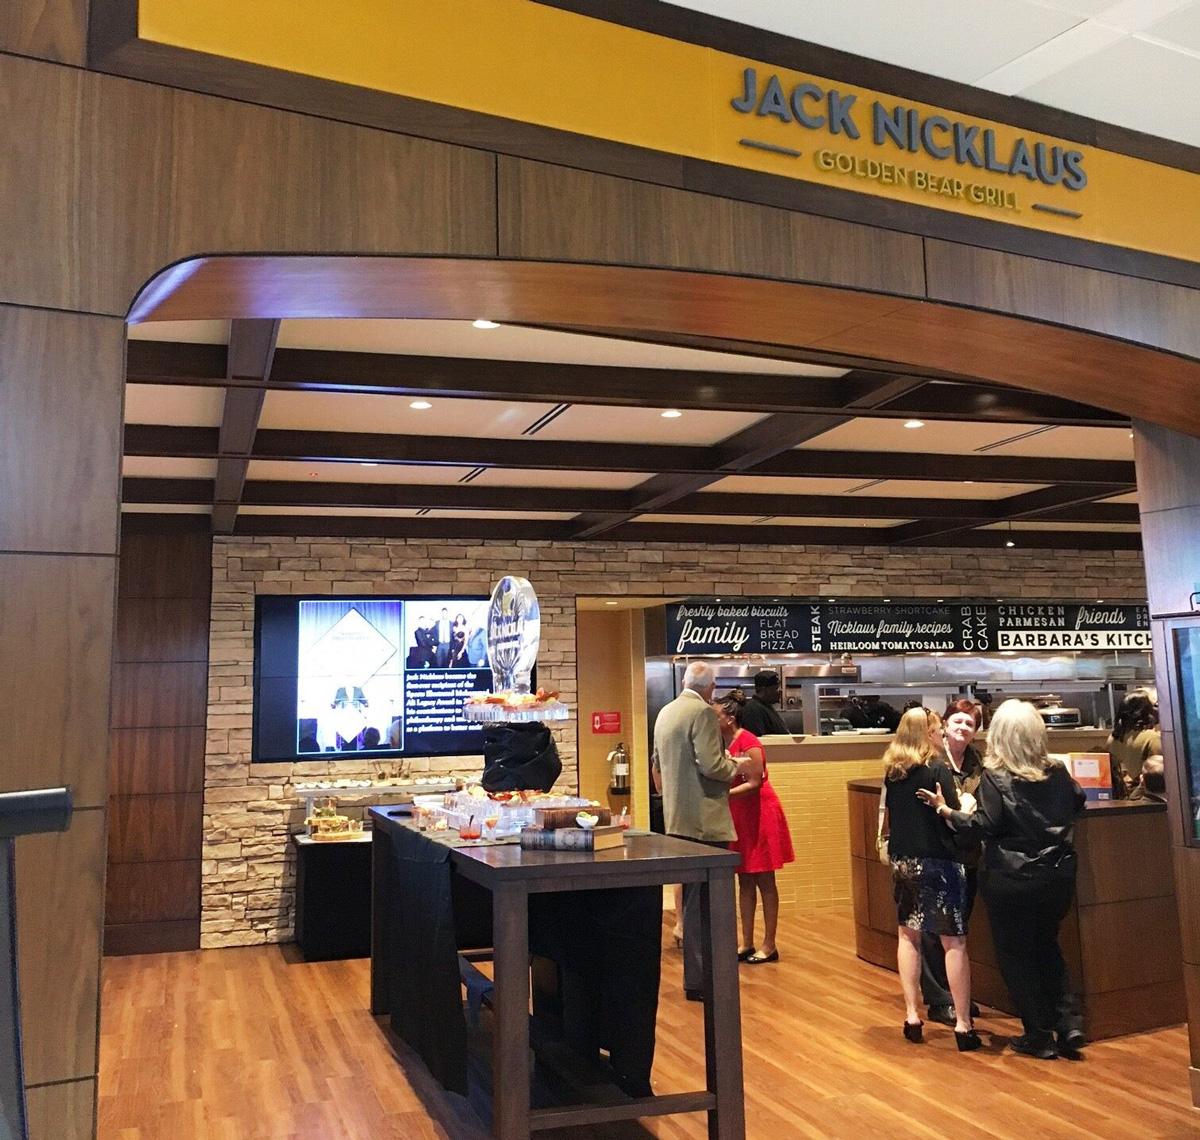 Jack Nicklaus Golden Bear Grill at Charleston International Airport